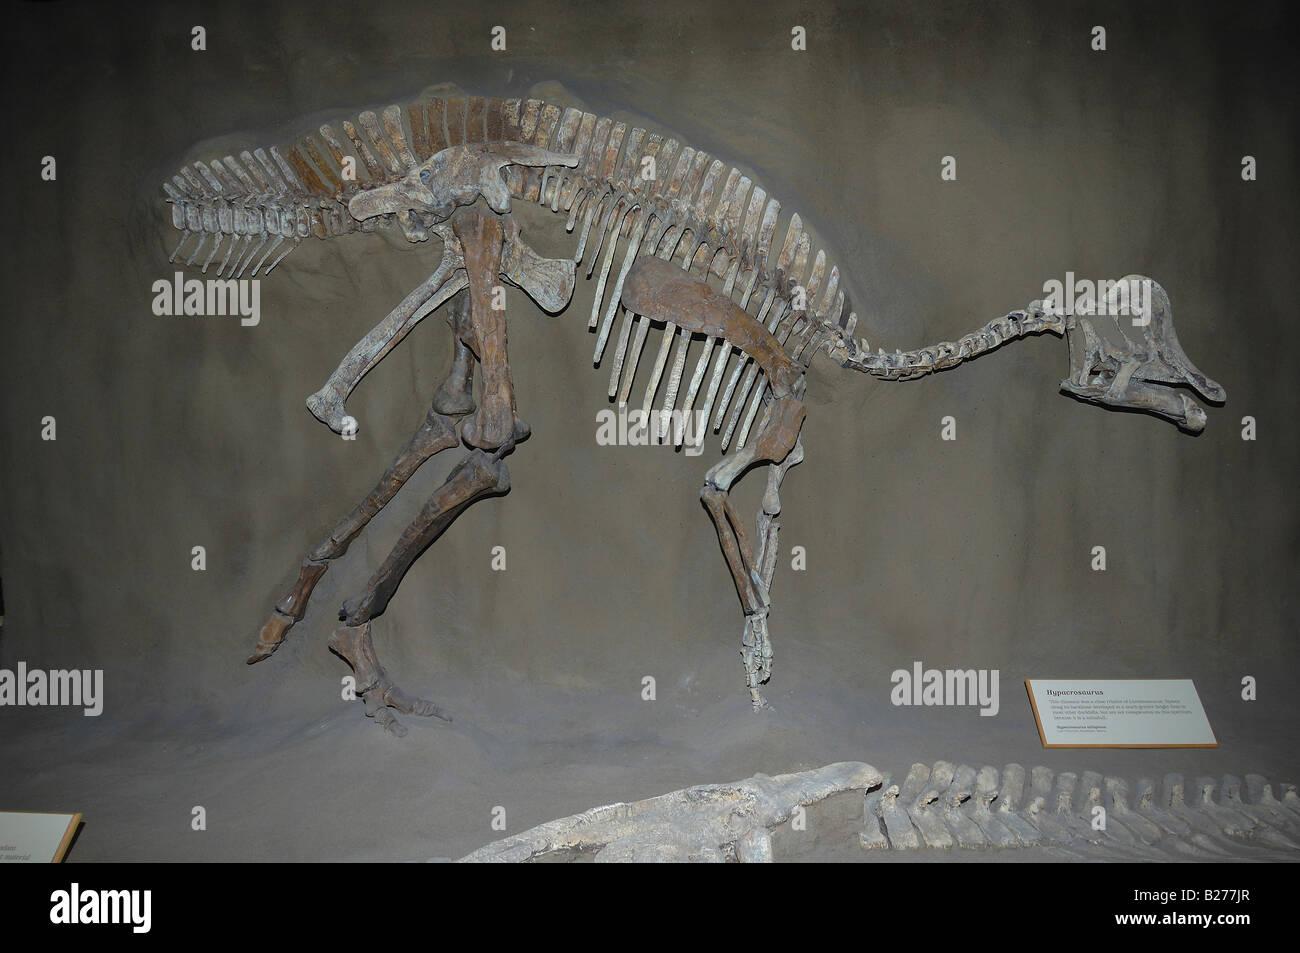 Dinosaur fossil at Royal Tyrrell in Drumheller, Alberta, Canada - Stock Image